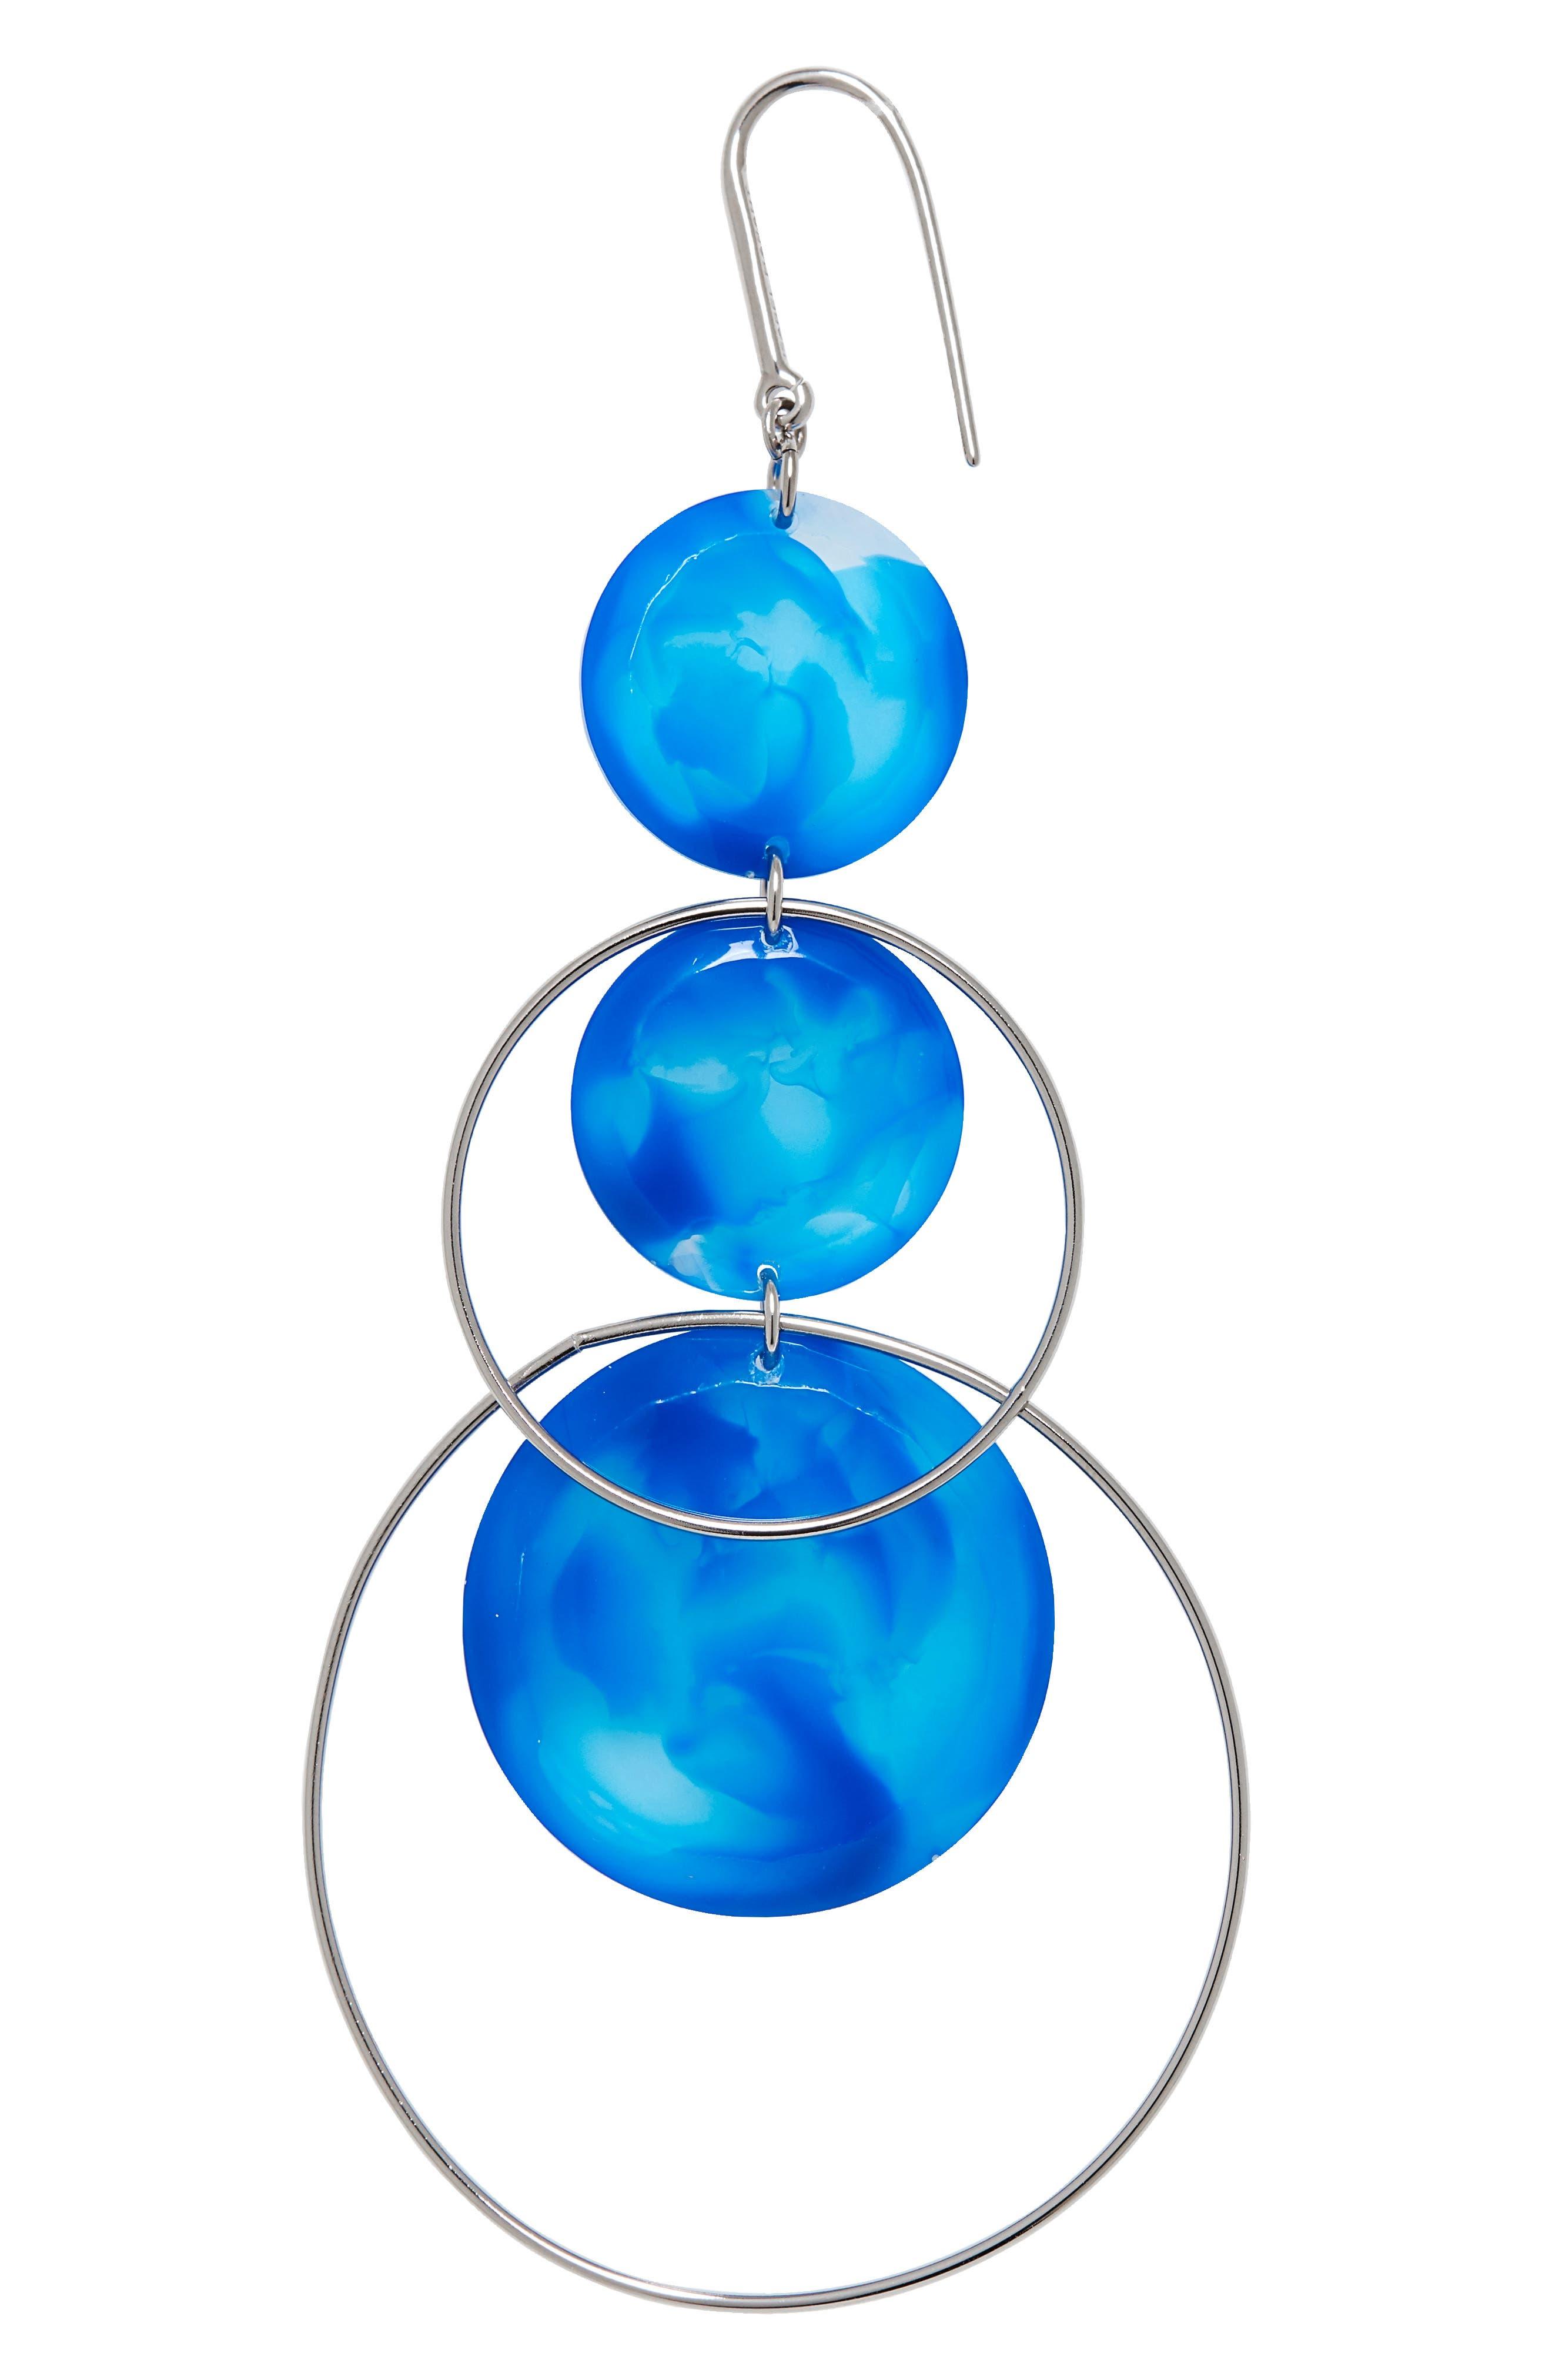 ISABEL MARANT, Harlem Circle Drop Earrings, Alternate thumbnail 3, color, BLUE